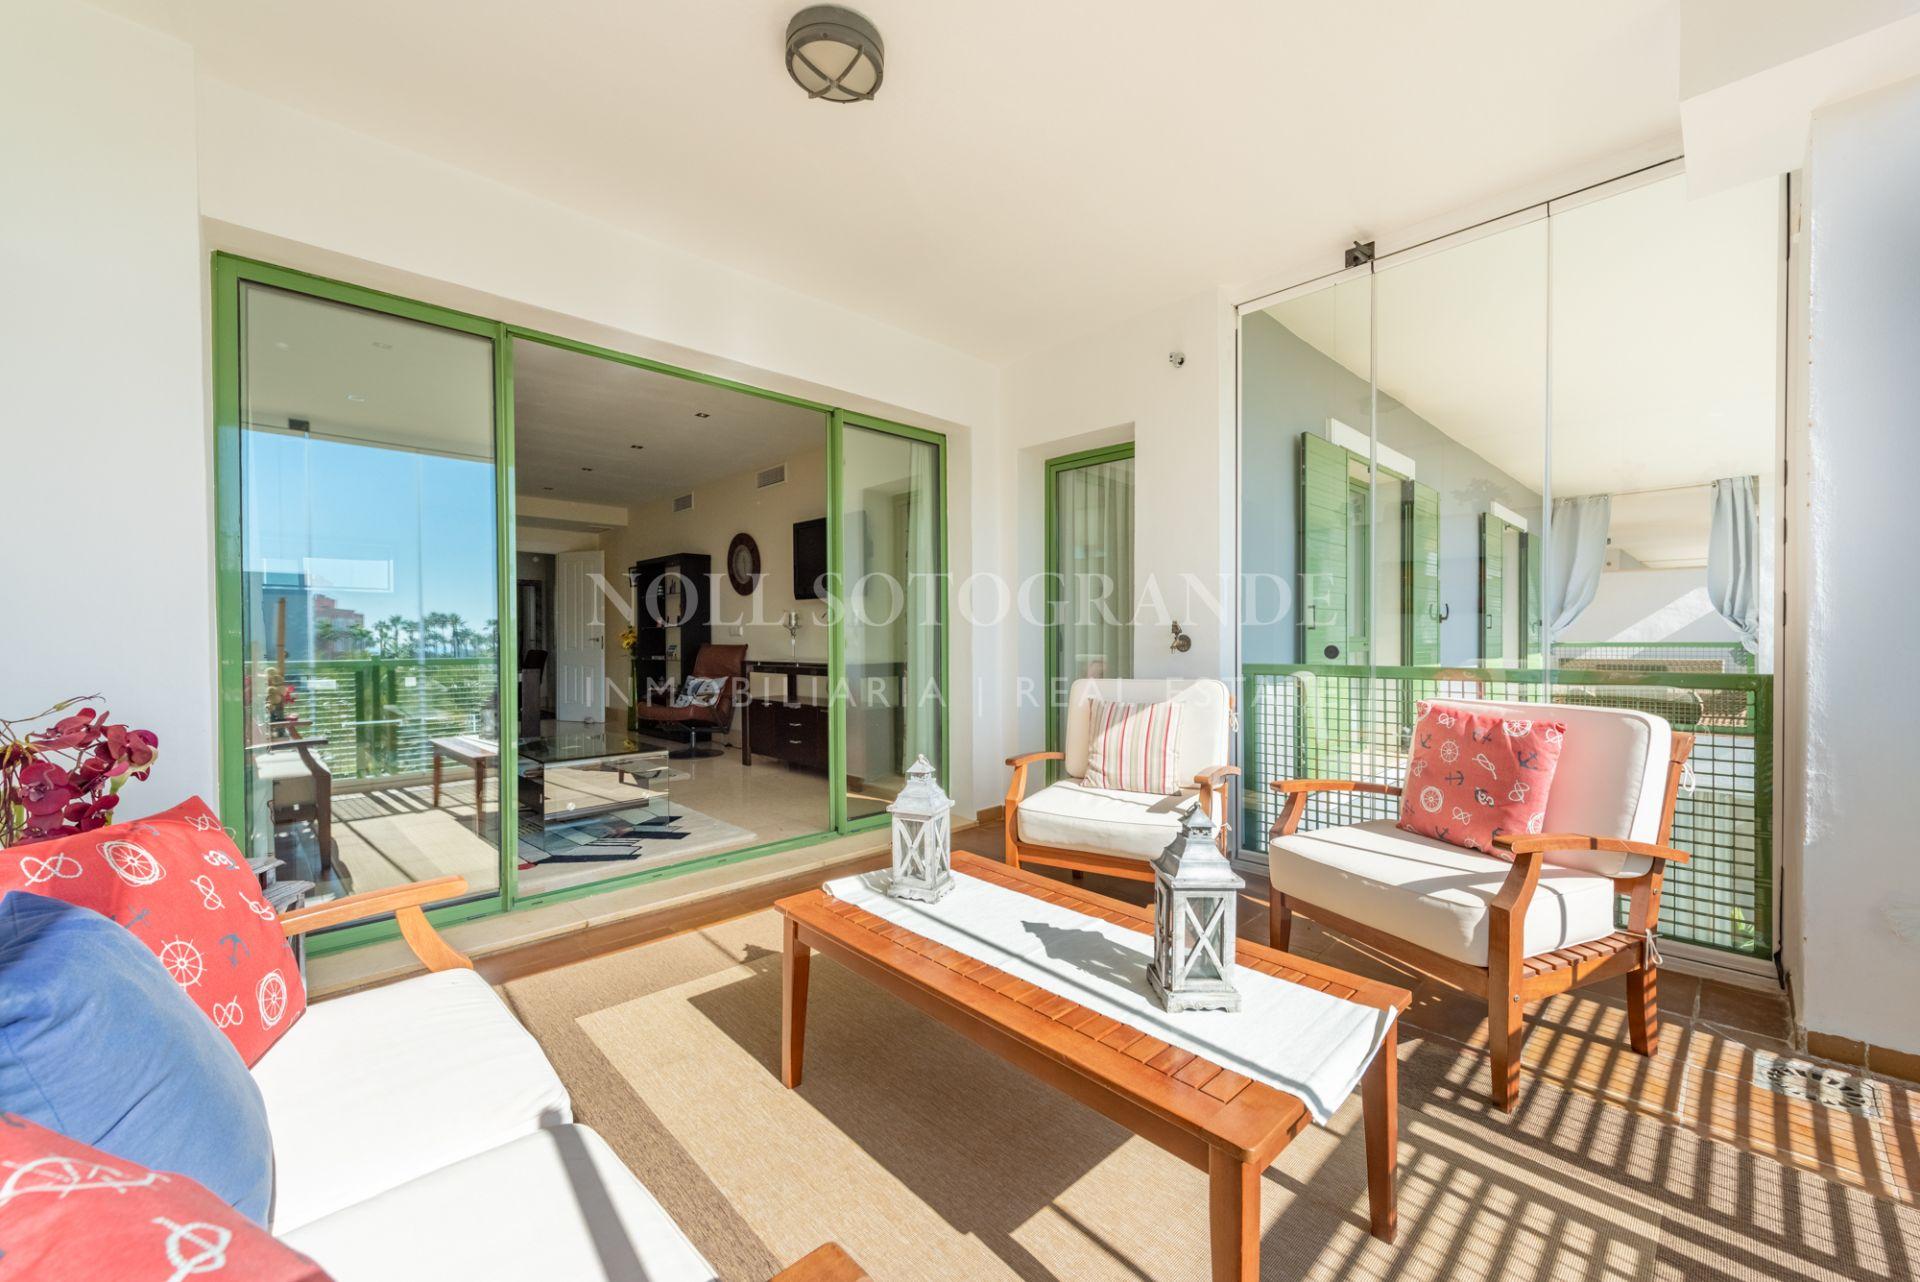 Apartment for sale in Marina de Sotogrande, Sotogrande